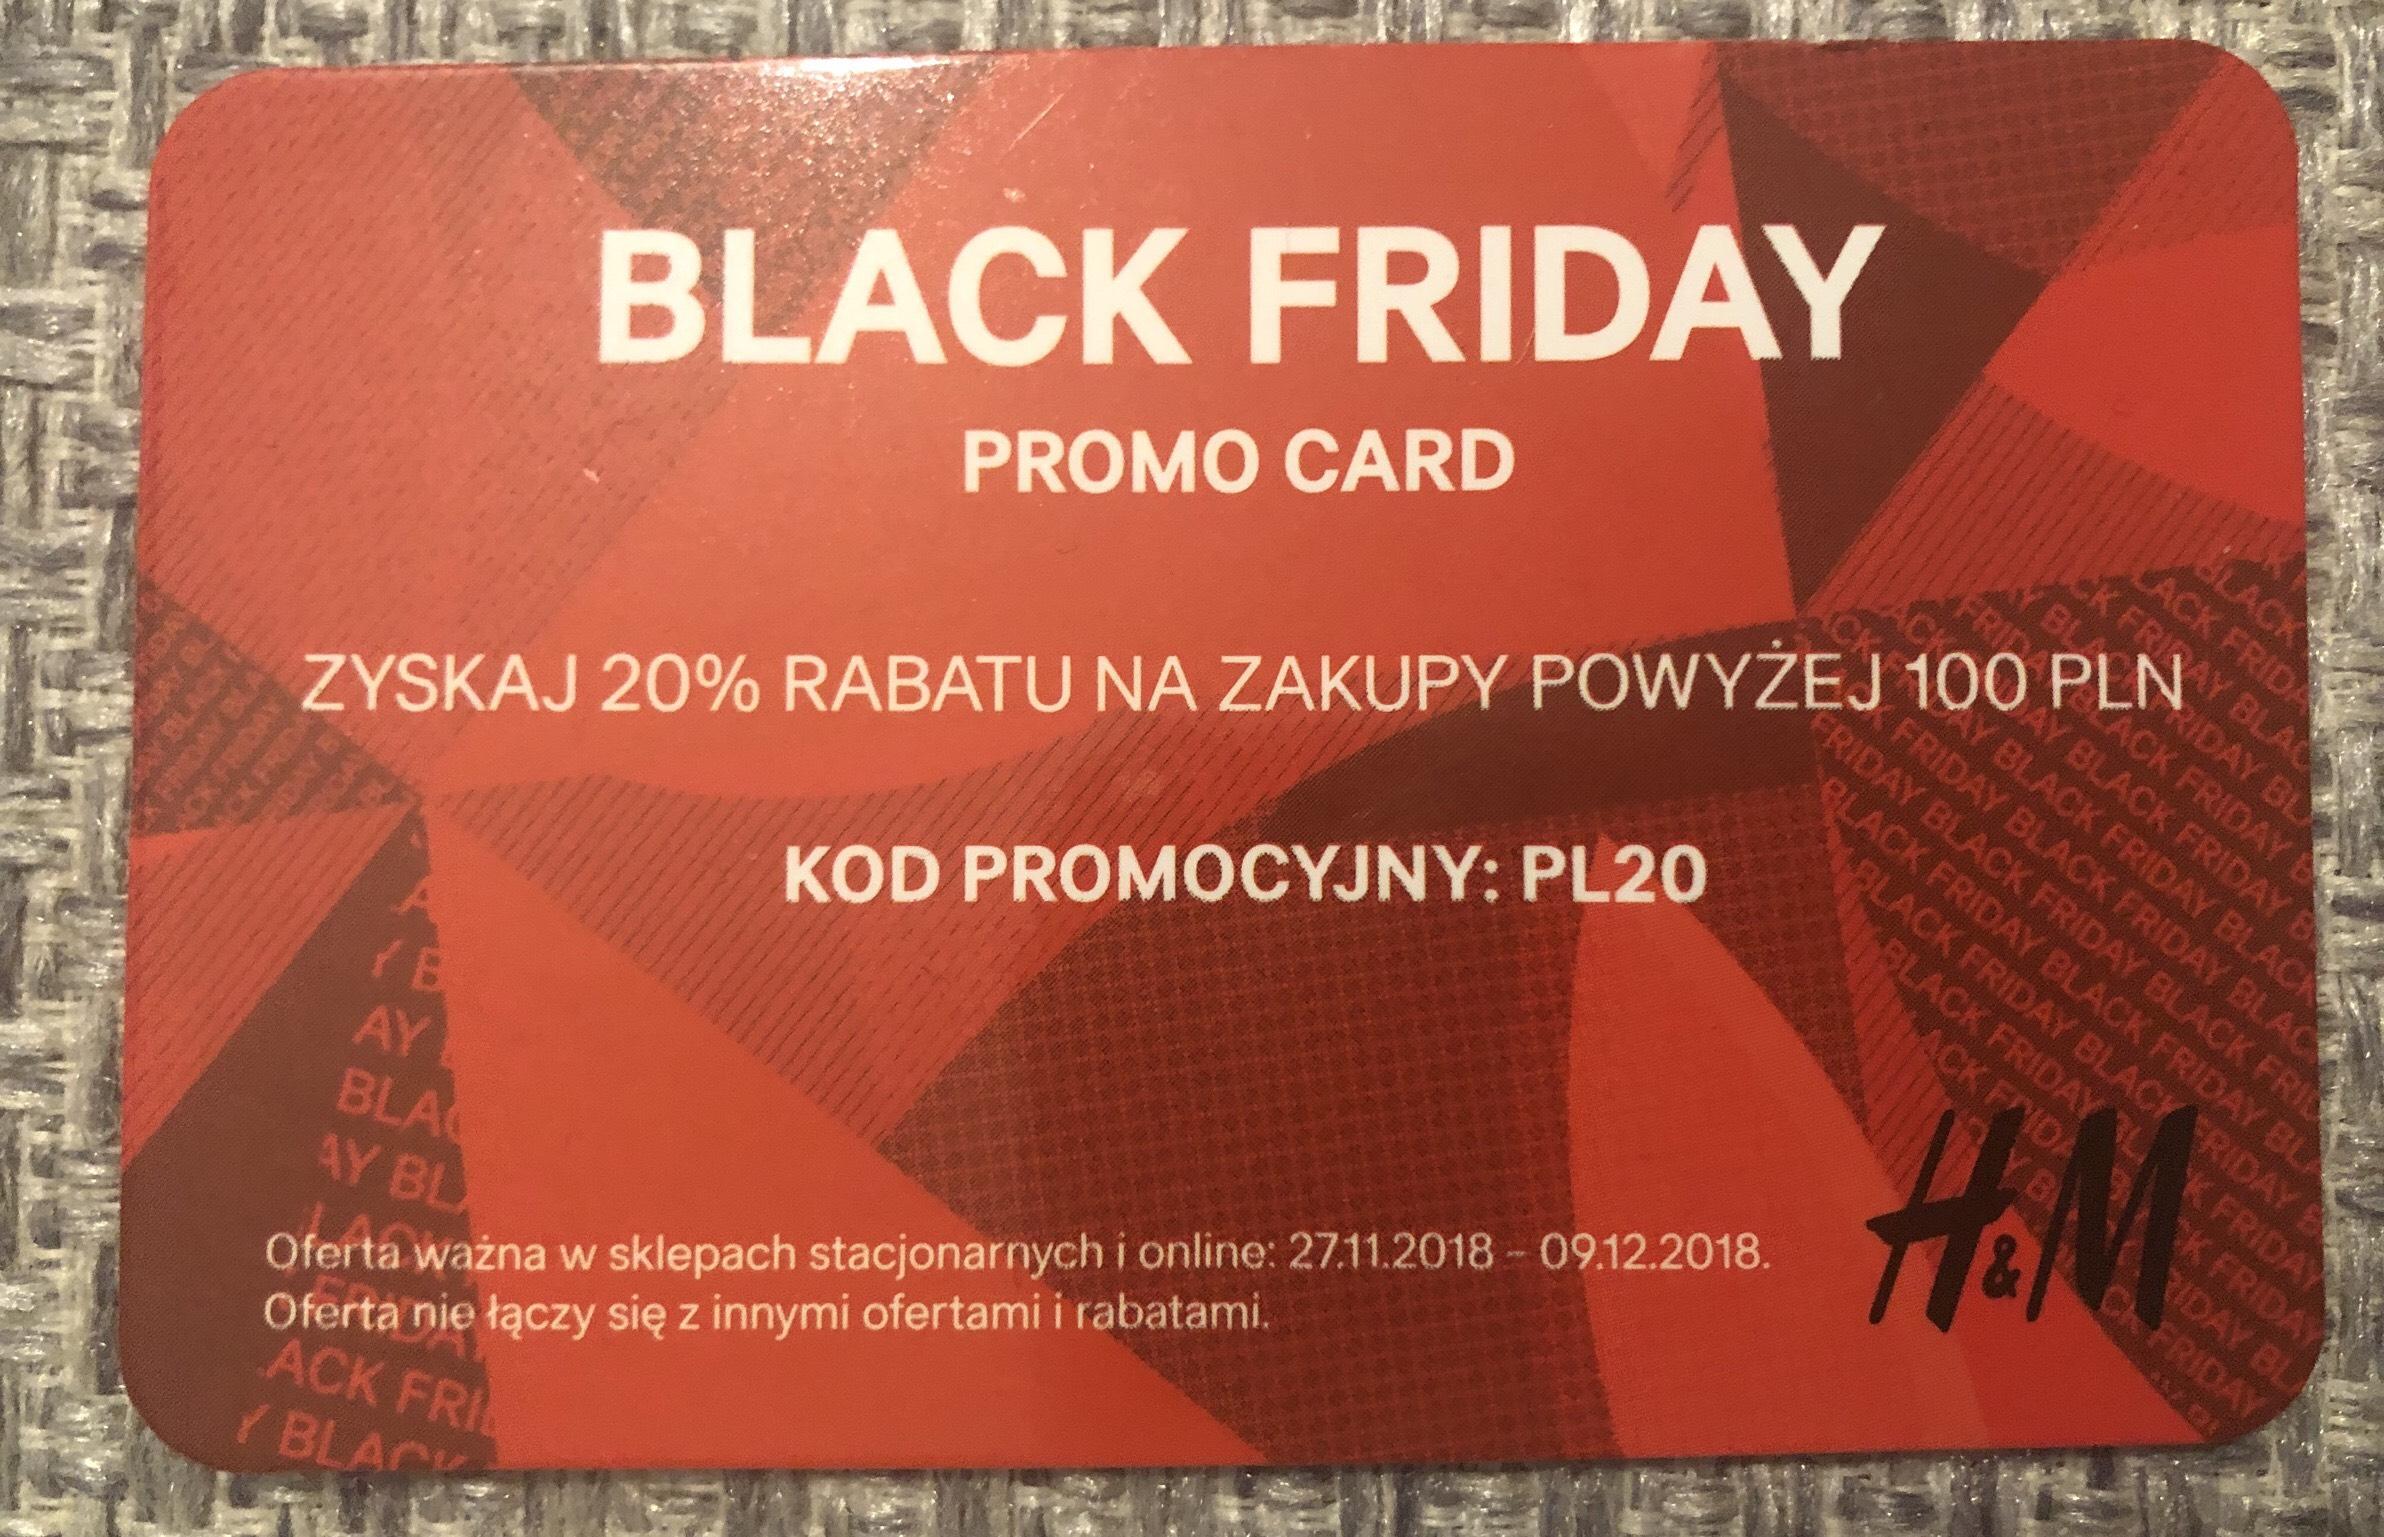 Black Friday promo card H&M